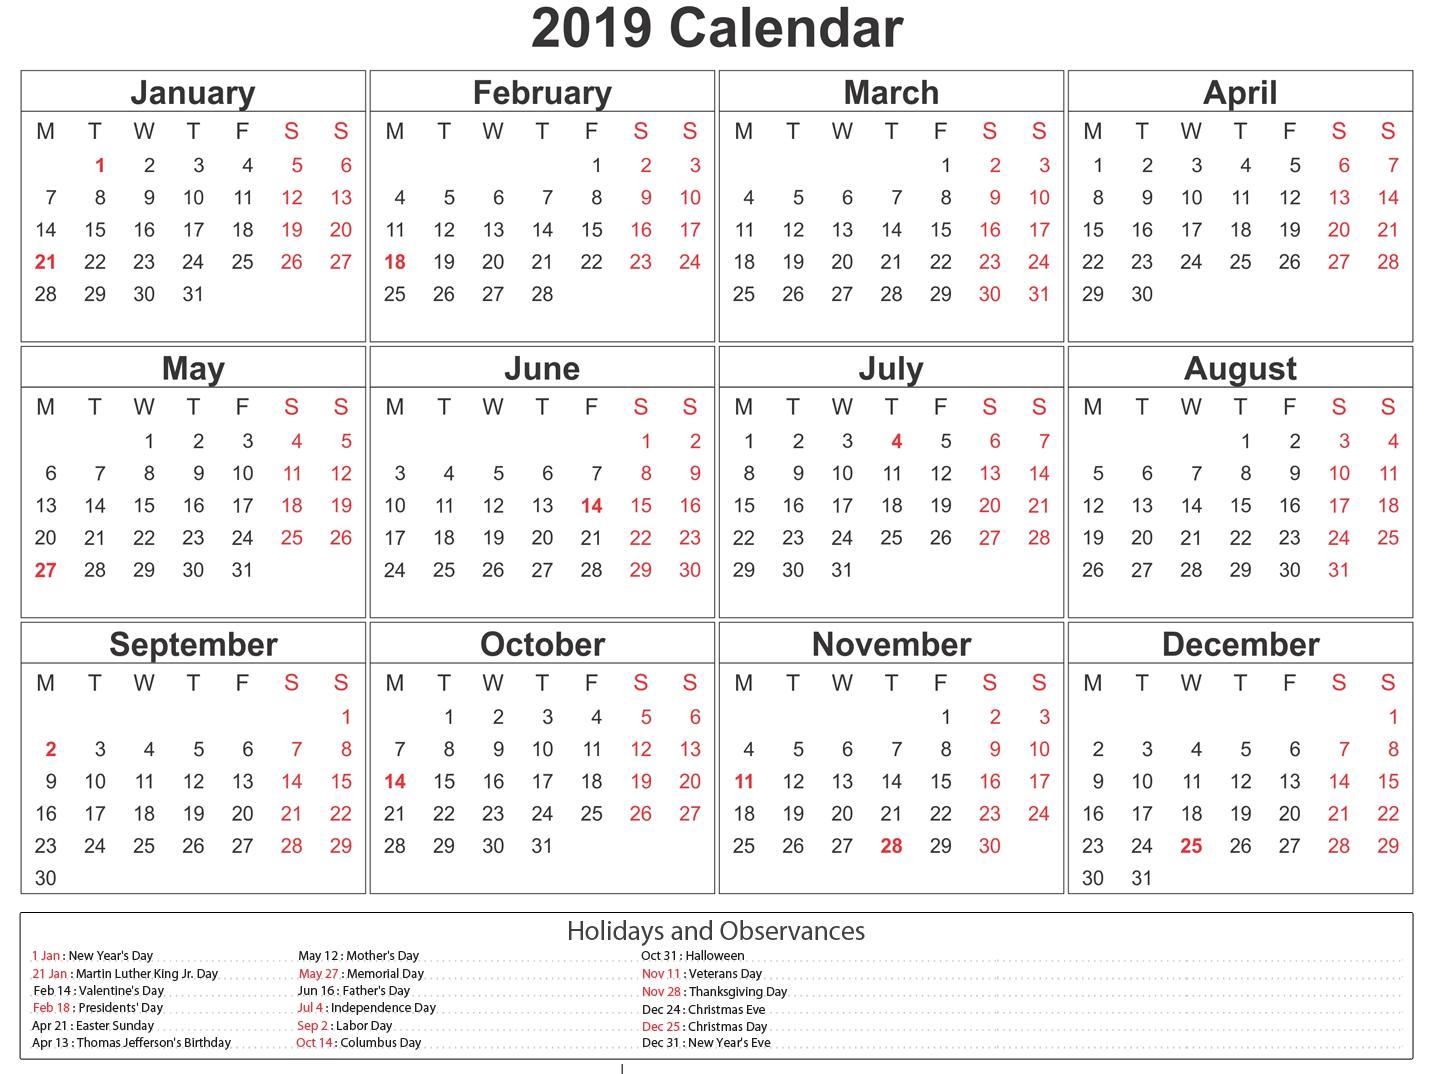 Printable South Africa 2019 Calendar #southafrica #calendar-January 2020 Calendar South Africa